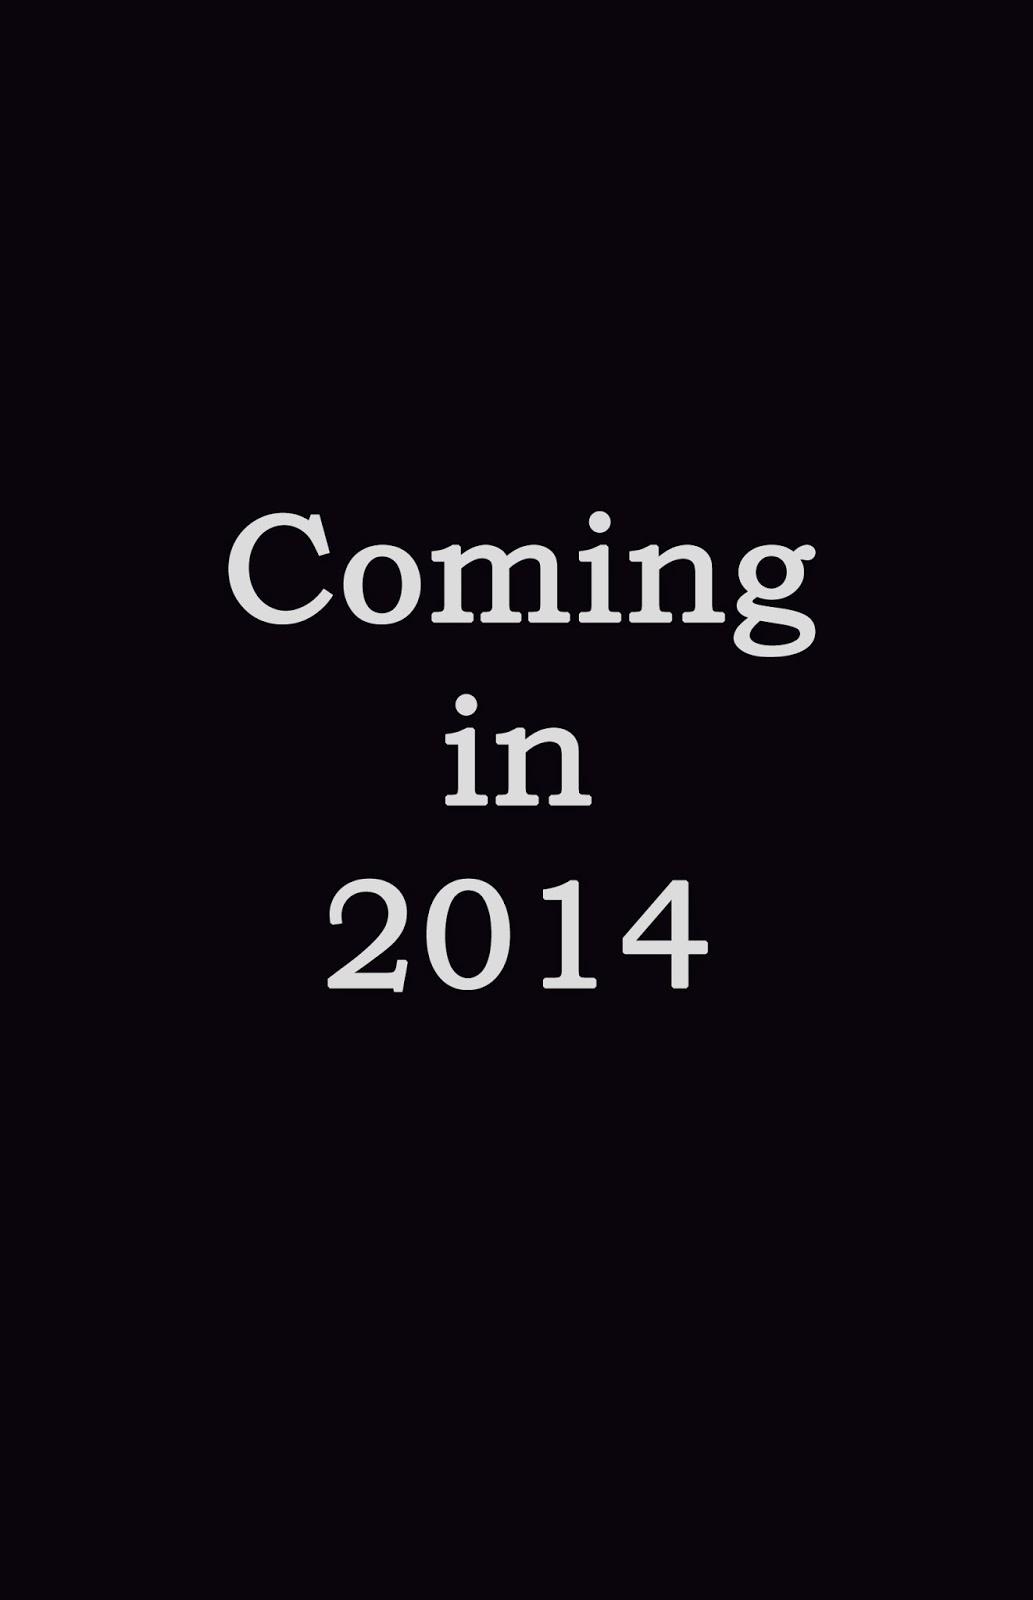 [Image: Coming2014.jpg]